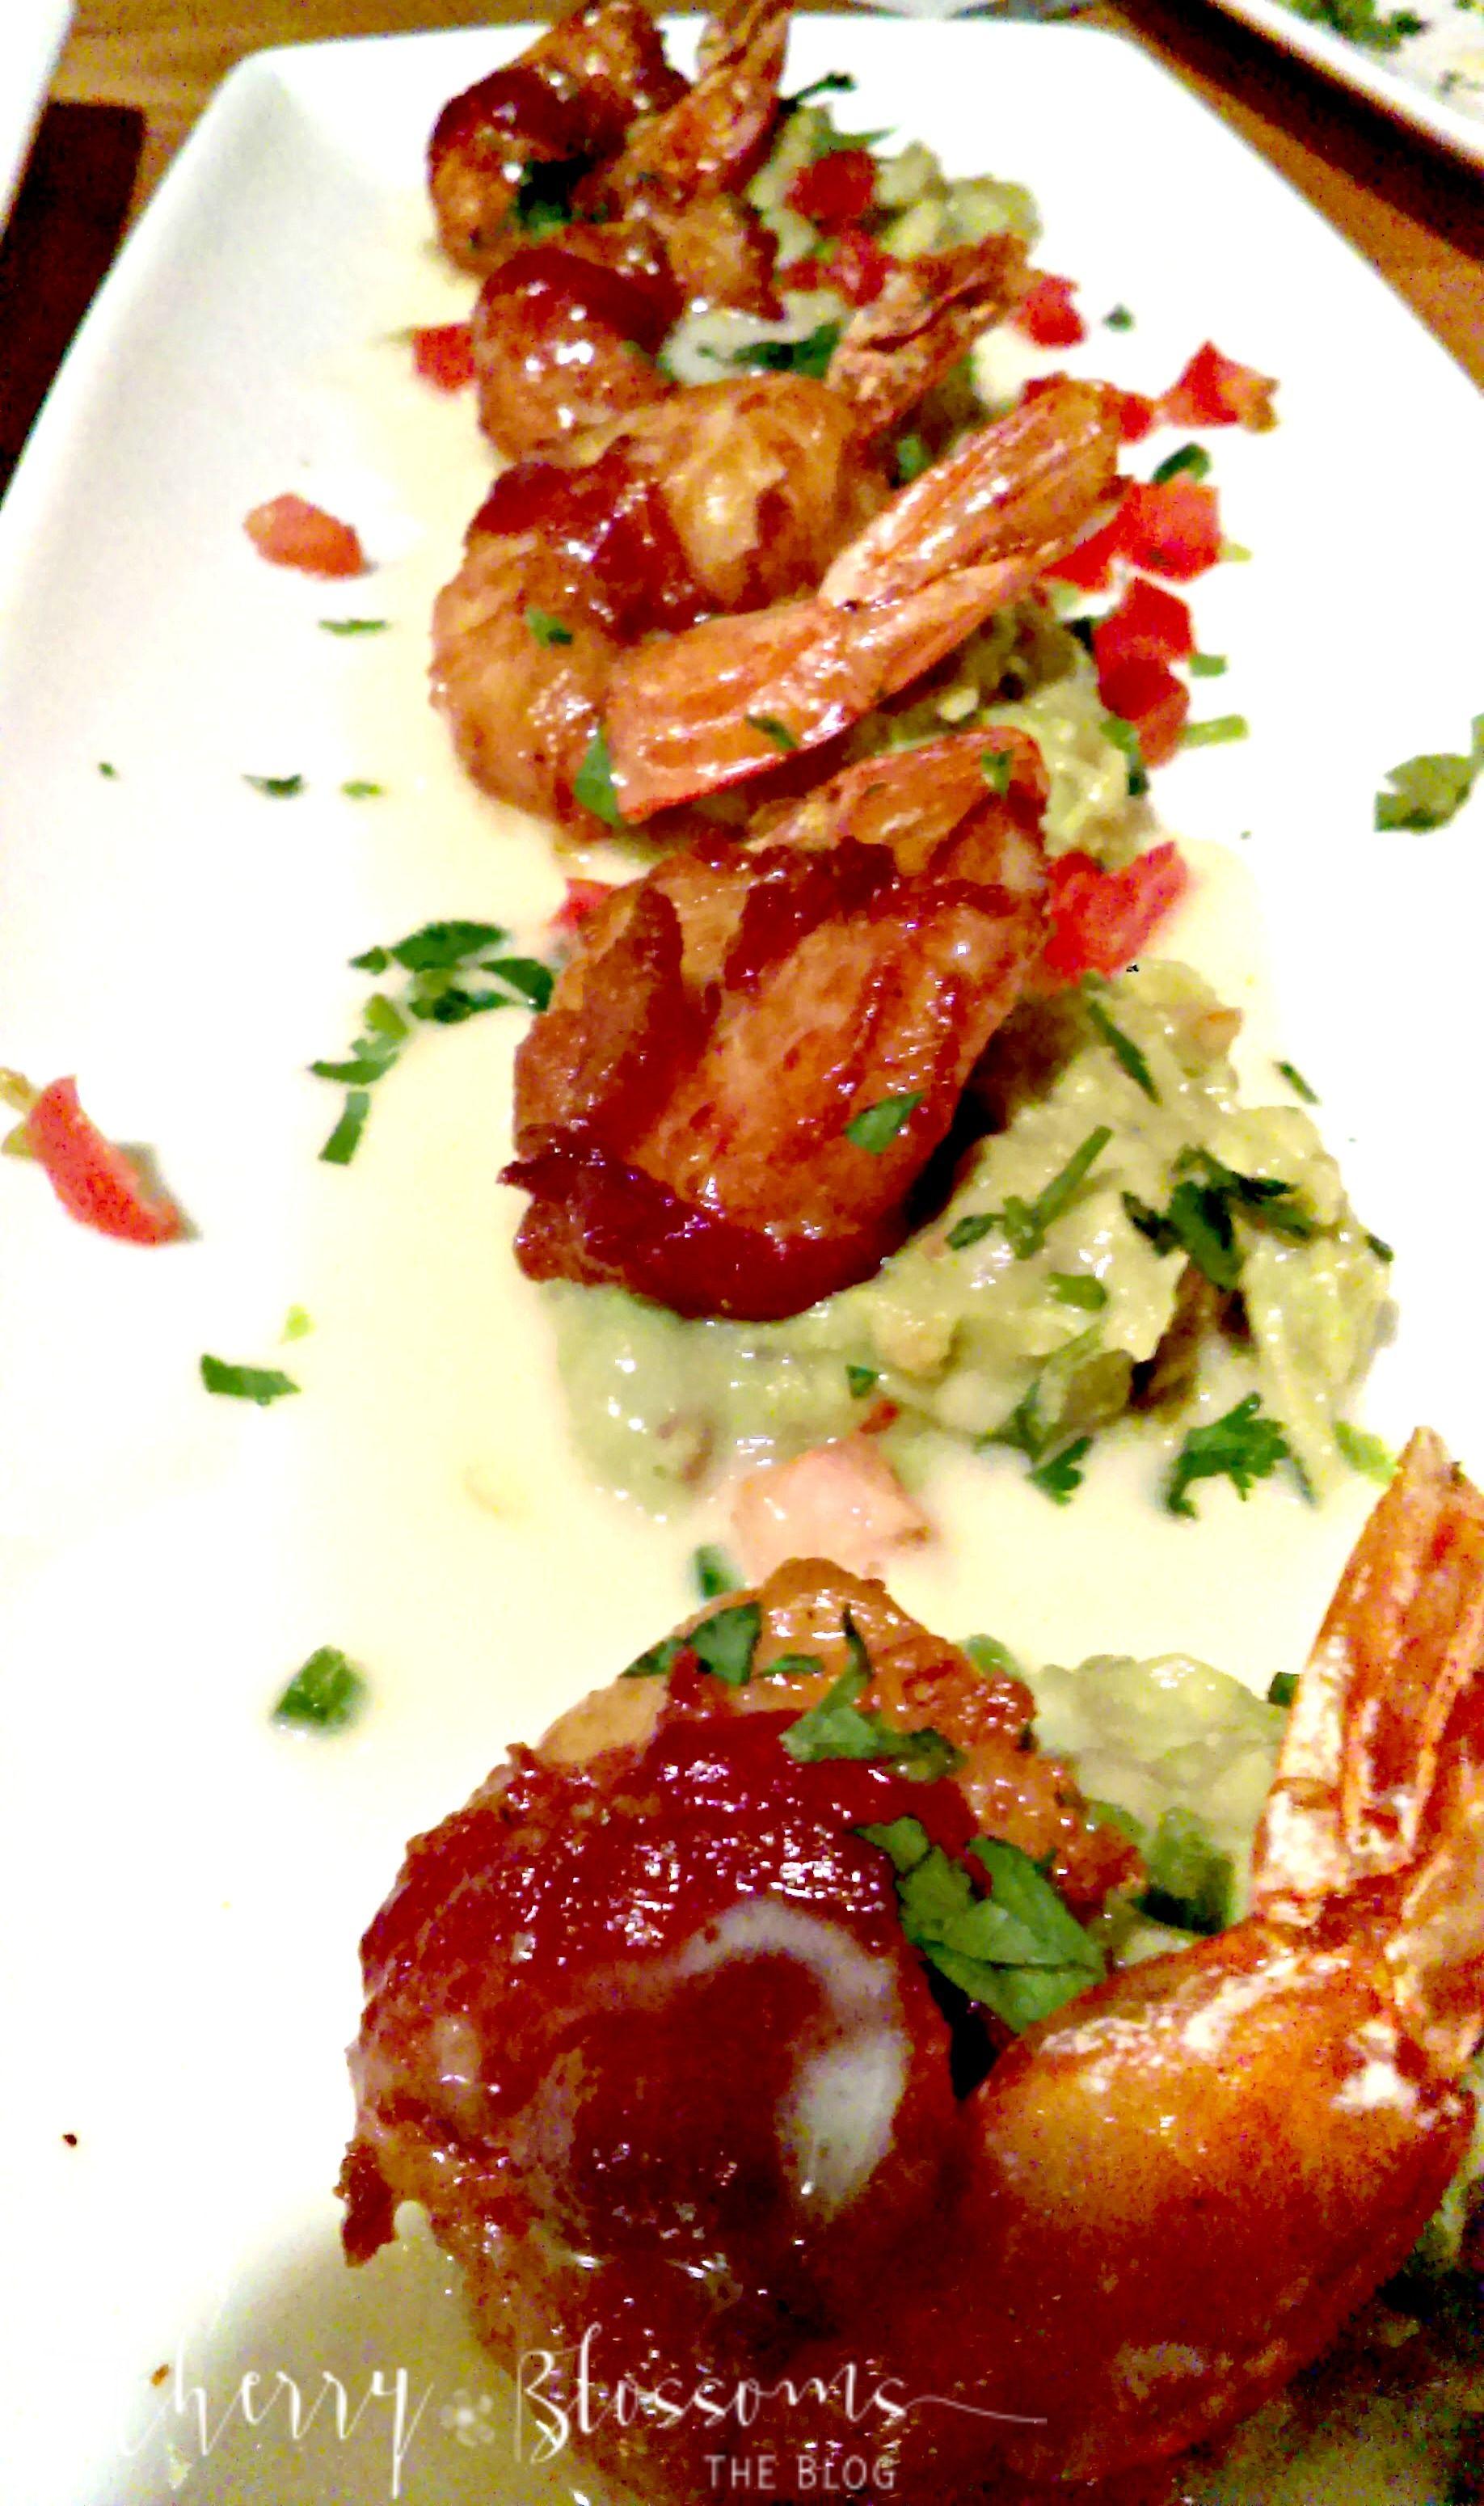 Cooper S Hawk Winery And Restaurant Ashburn Va Drunken Shrimp Recipe Mexican Drunken Shrimp Recipe Mexican Shrimp Recipes